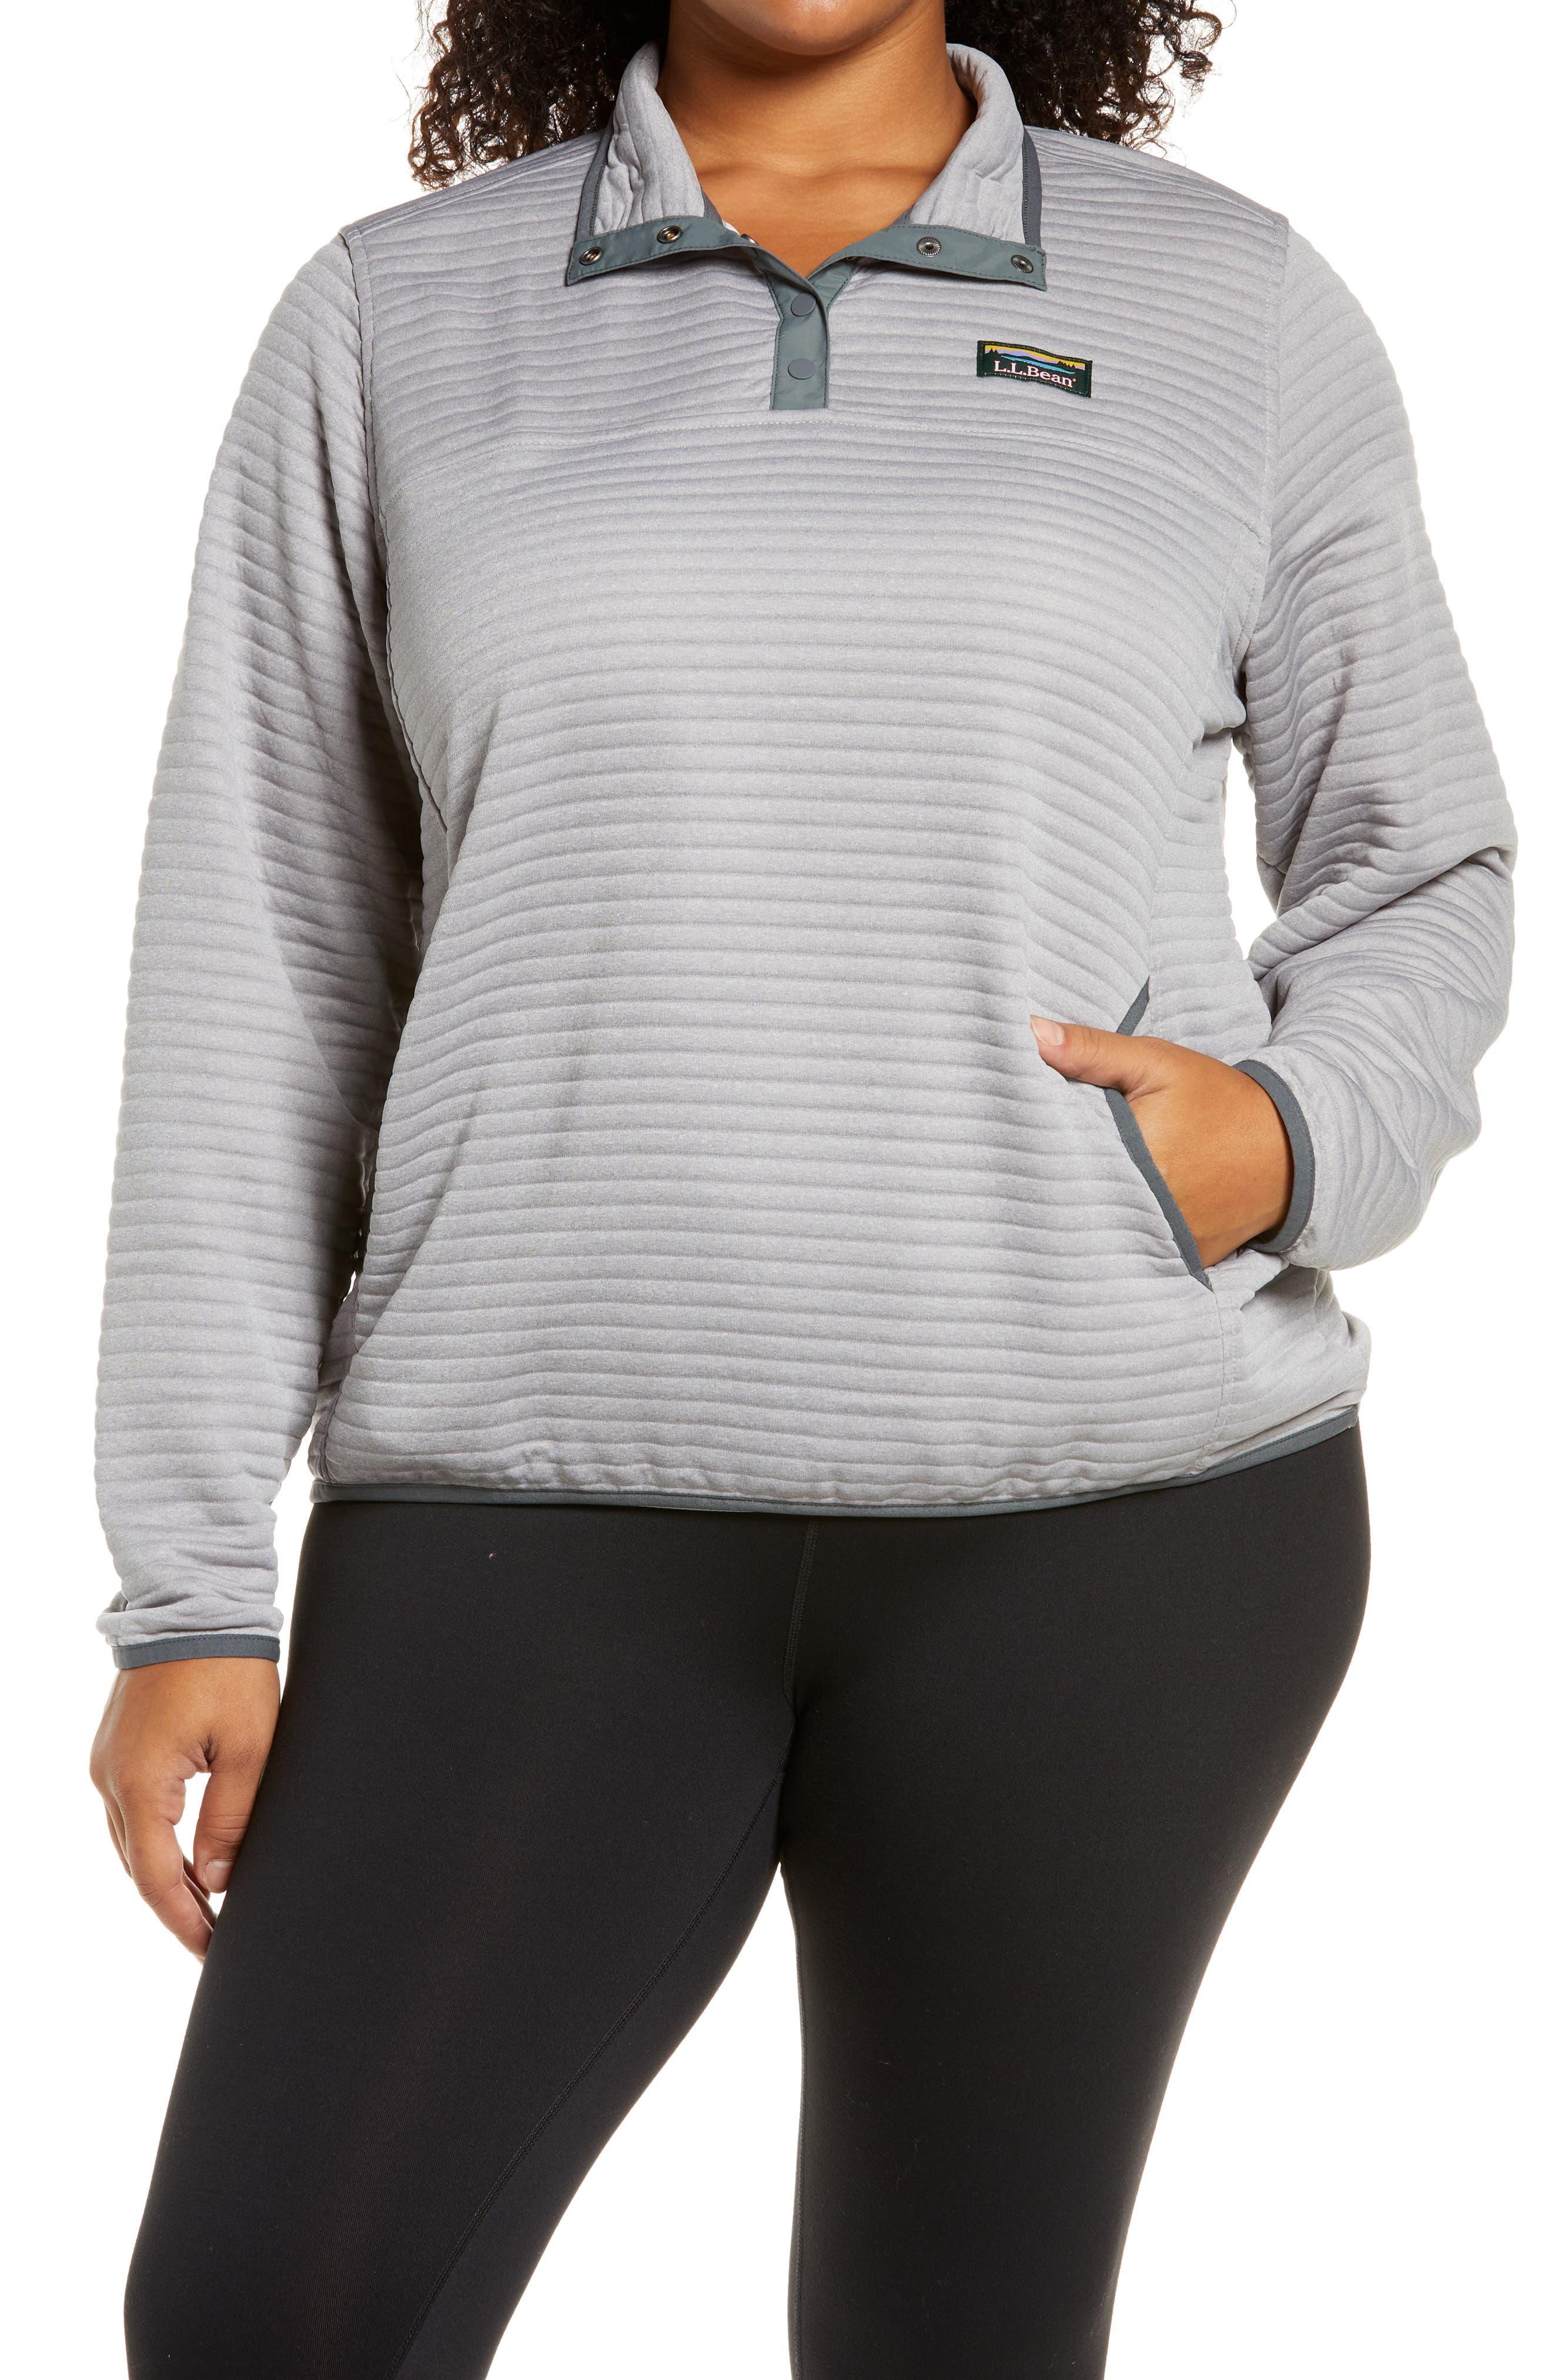 Plus Size Women's L.l. Bean Airlight Knit Pullover